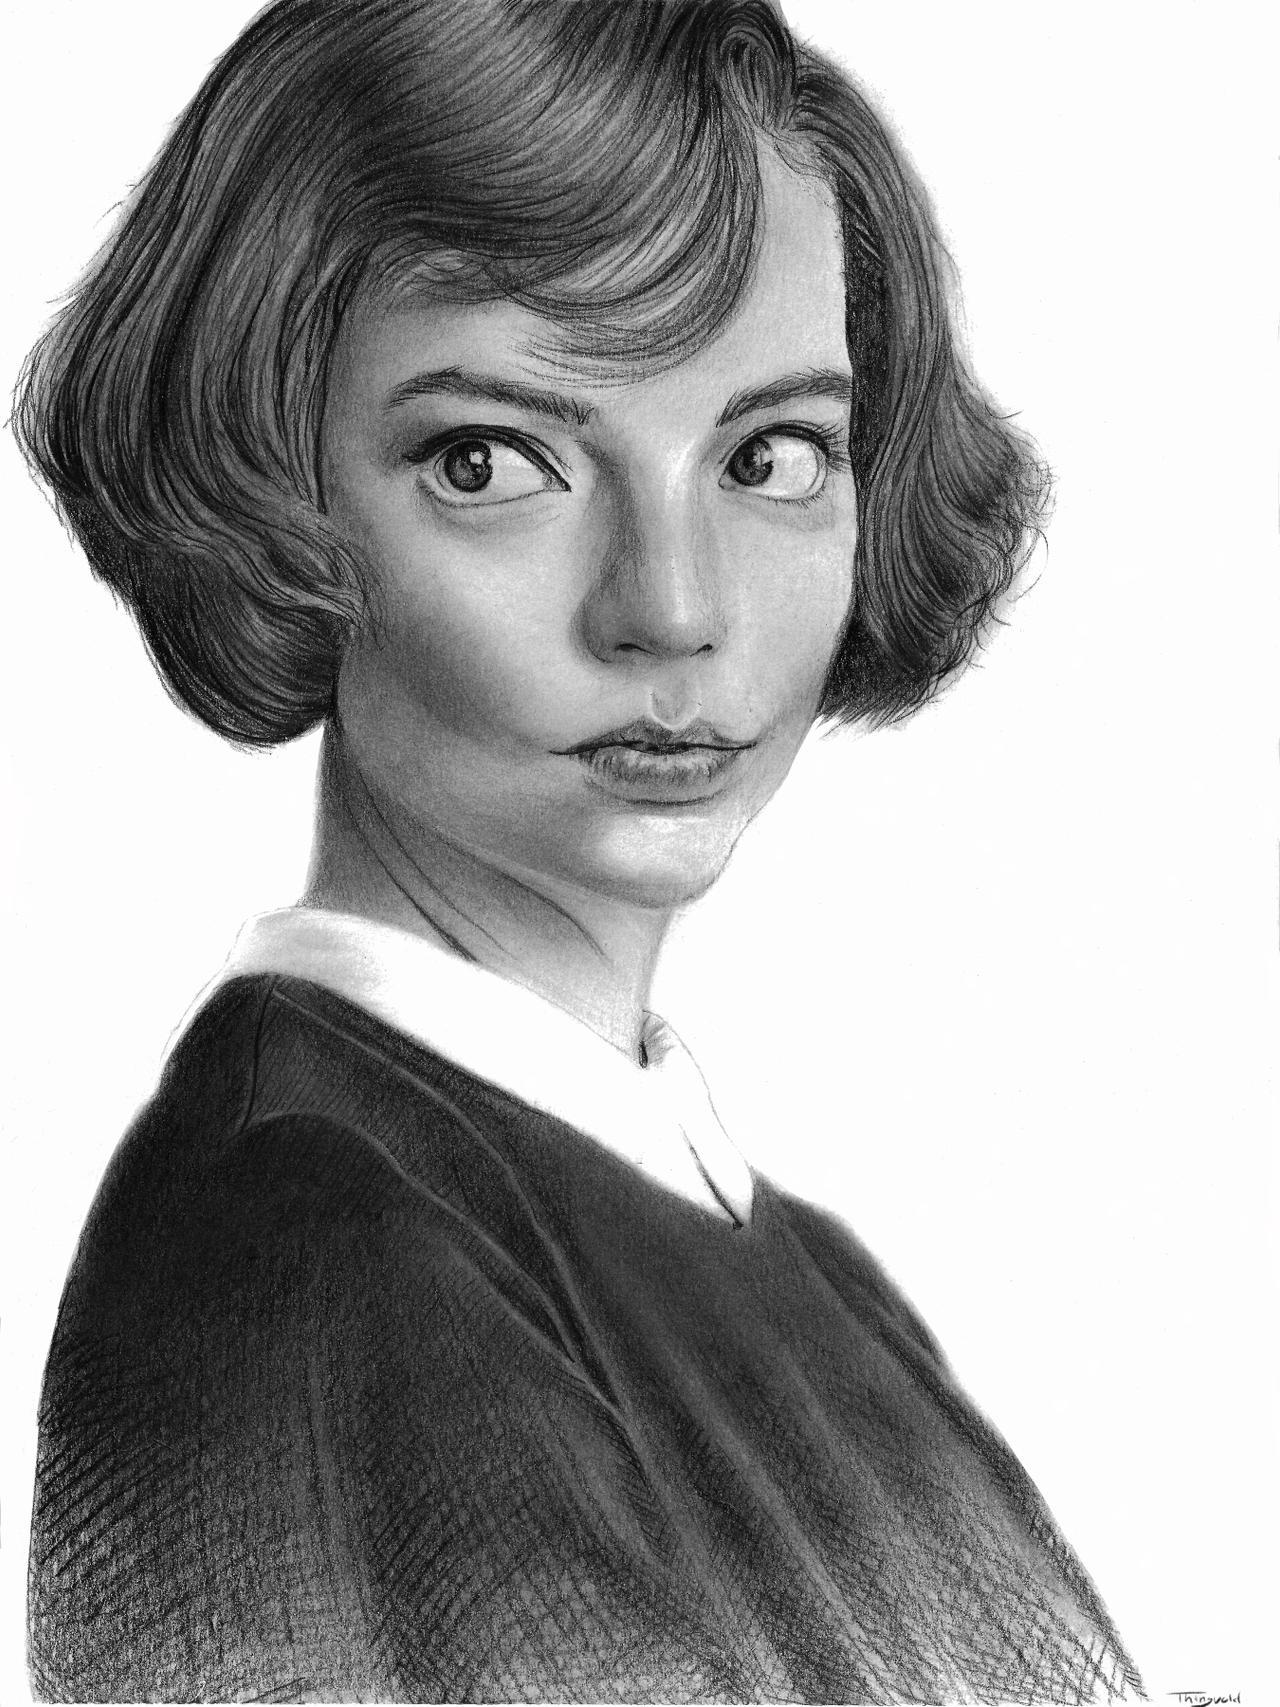 Beth Harmon pencil portrait